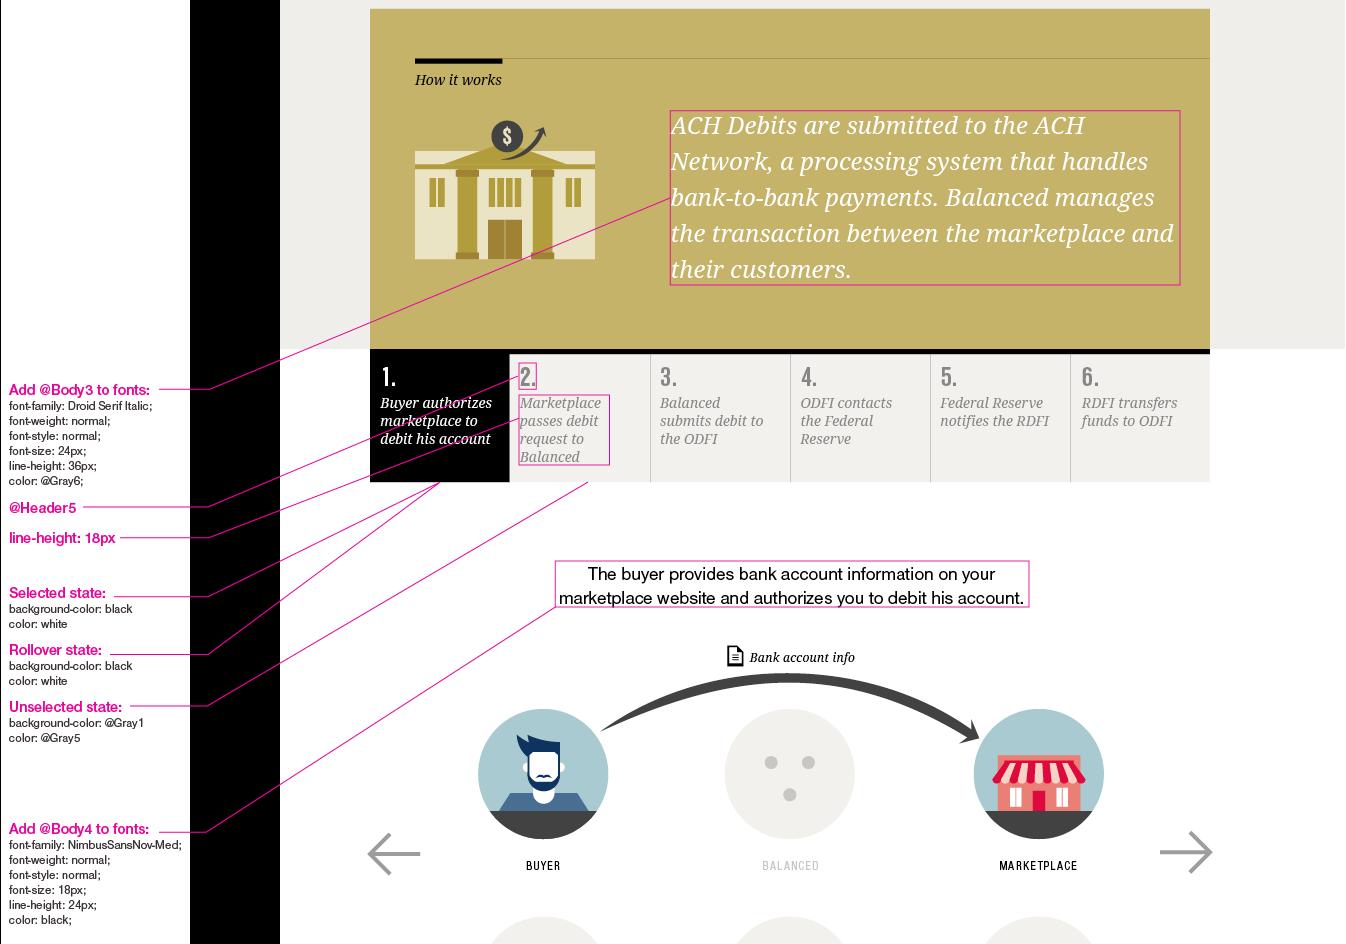 Ach debits issue 23 balancedbalancedpayments github screen shot 2013 09 18 at 12 02 29 pm pooptronica